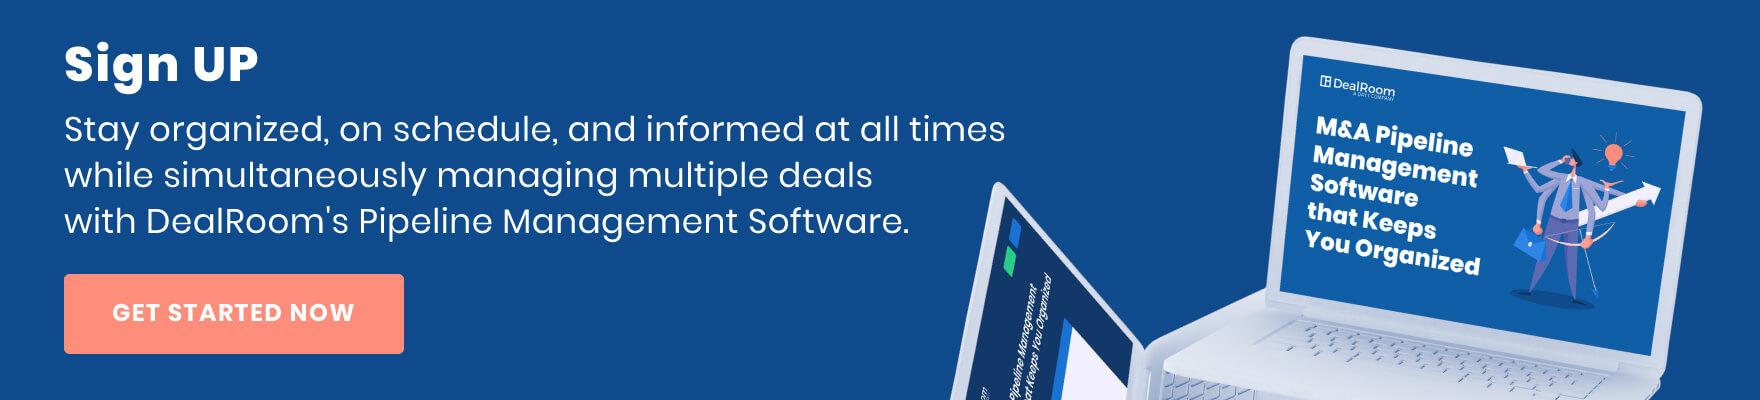 Manage multiple deals t a time